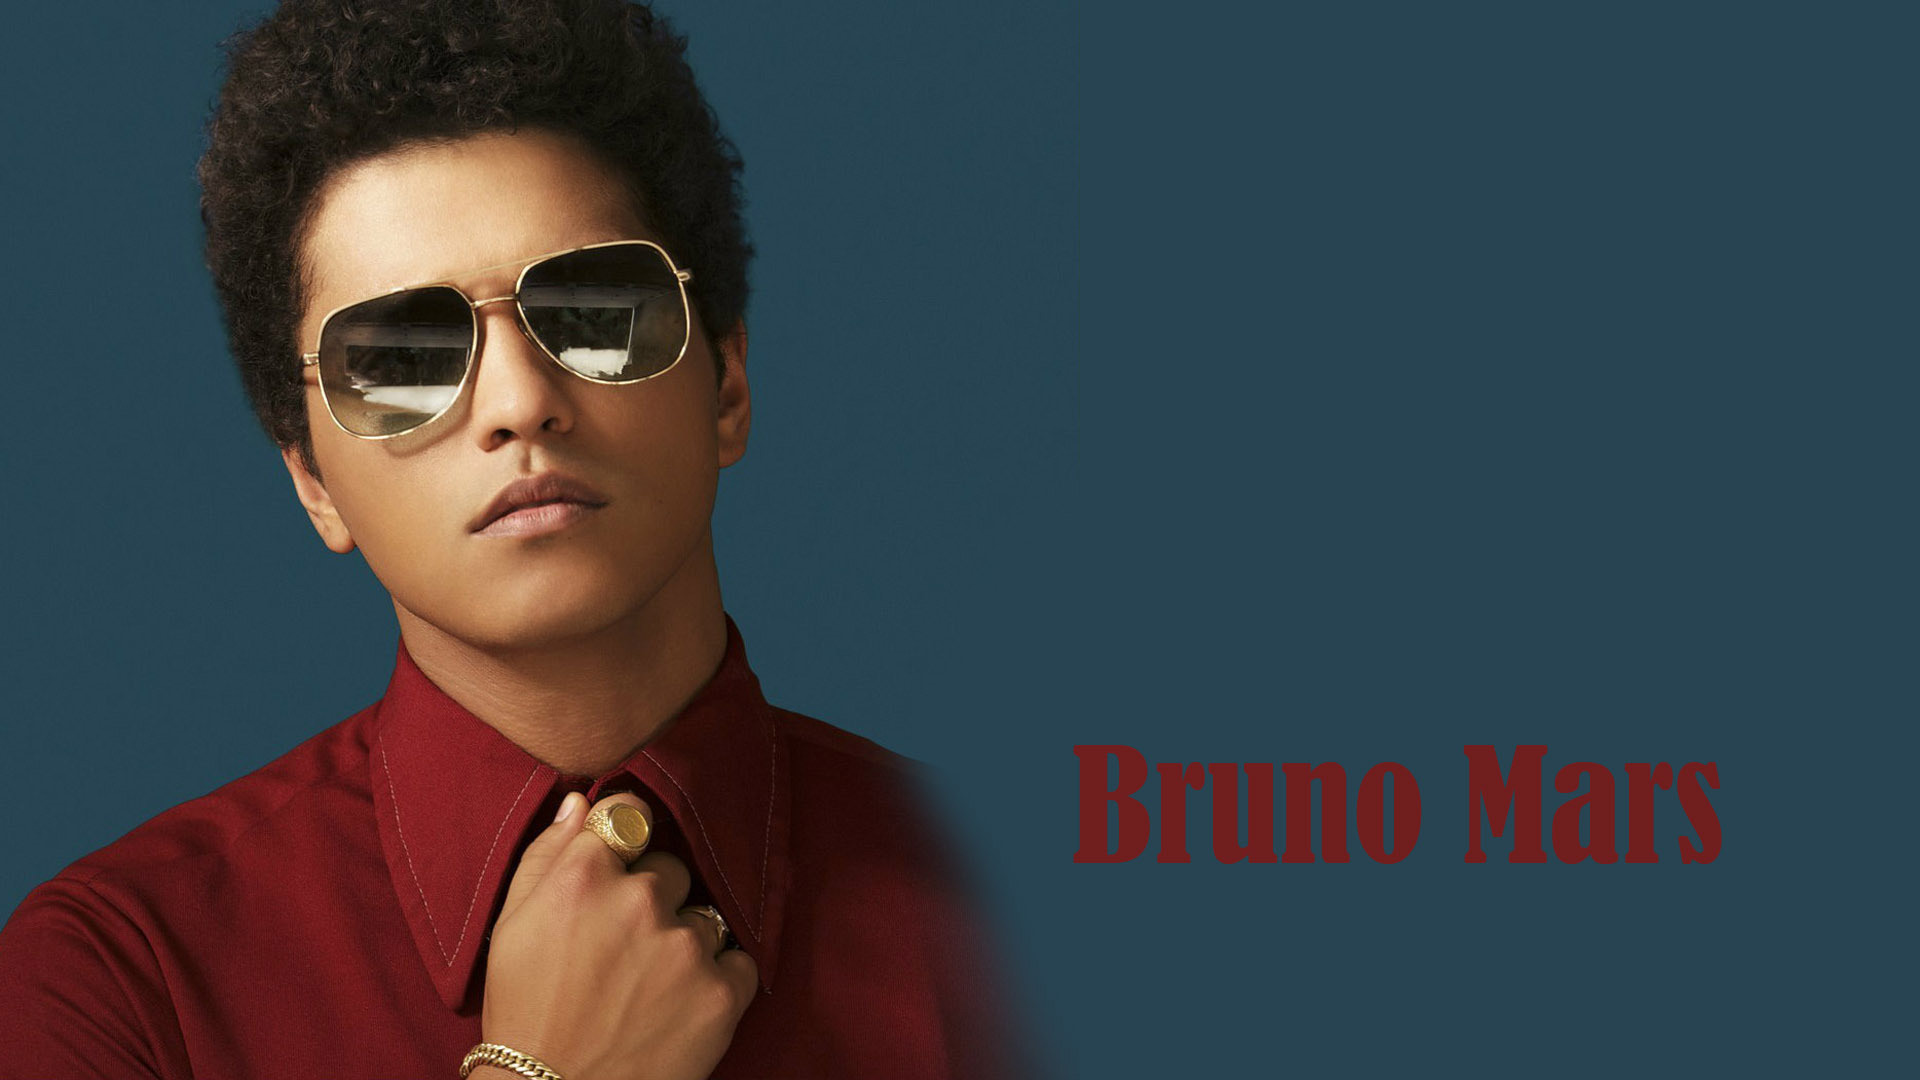 Fall Out Boy Desktop Wallpaper Bruno Mars Wallpapers Hd Pixelstalk Net